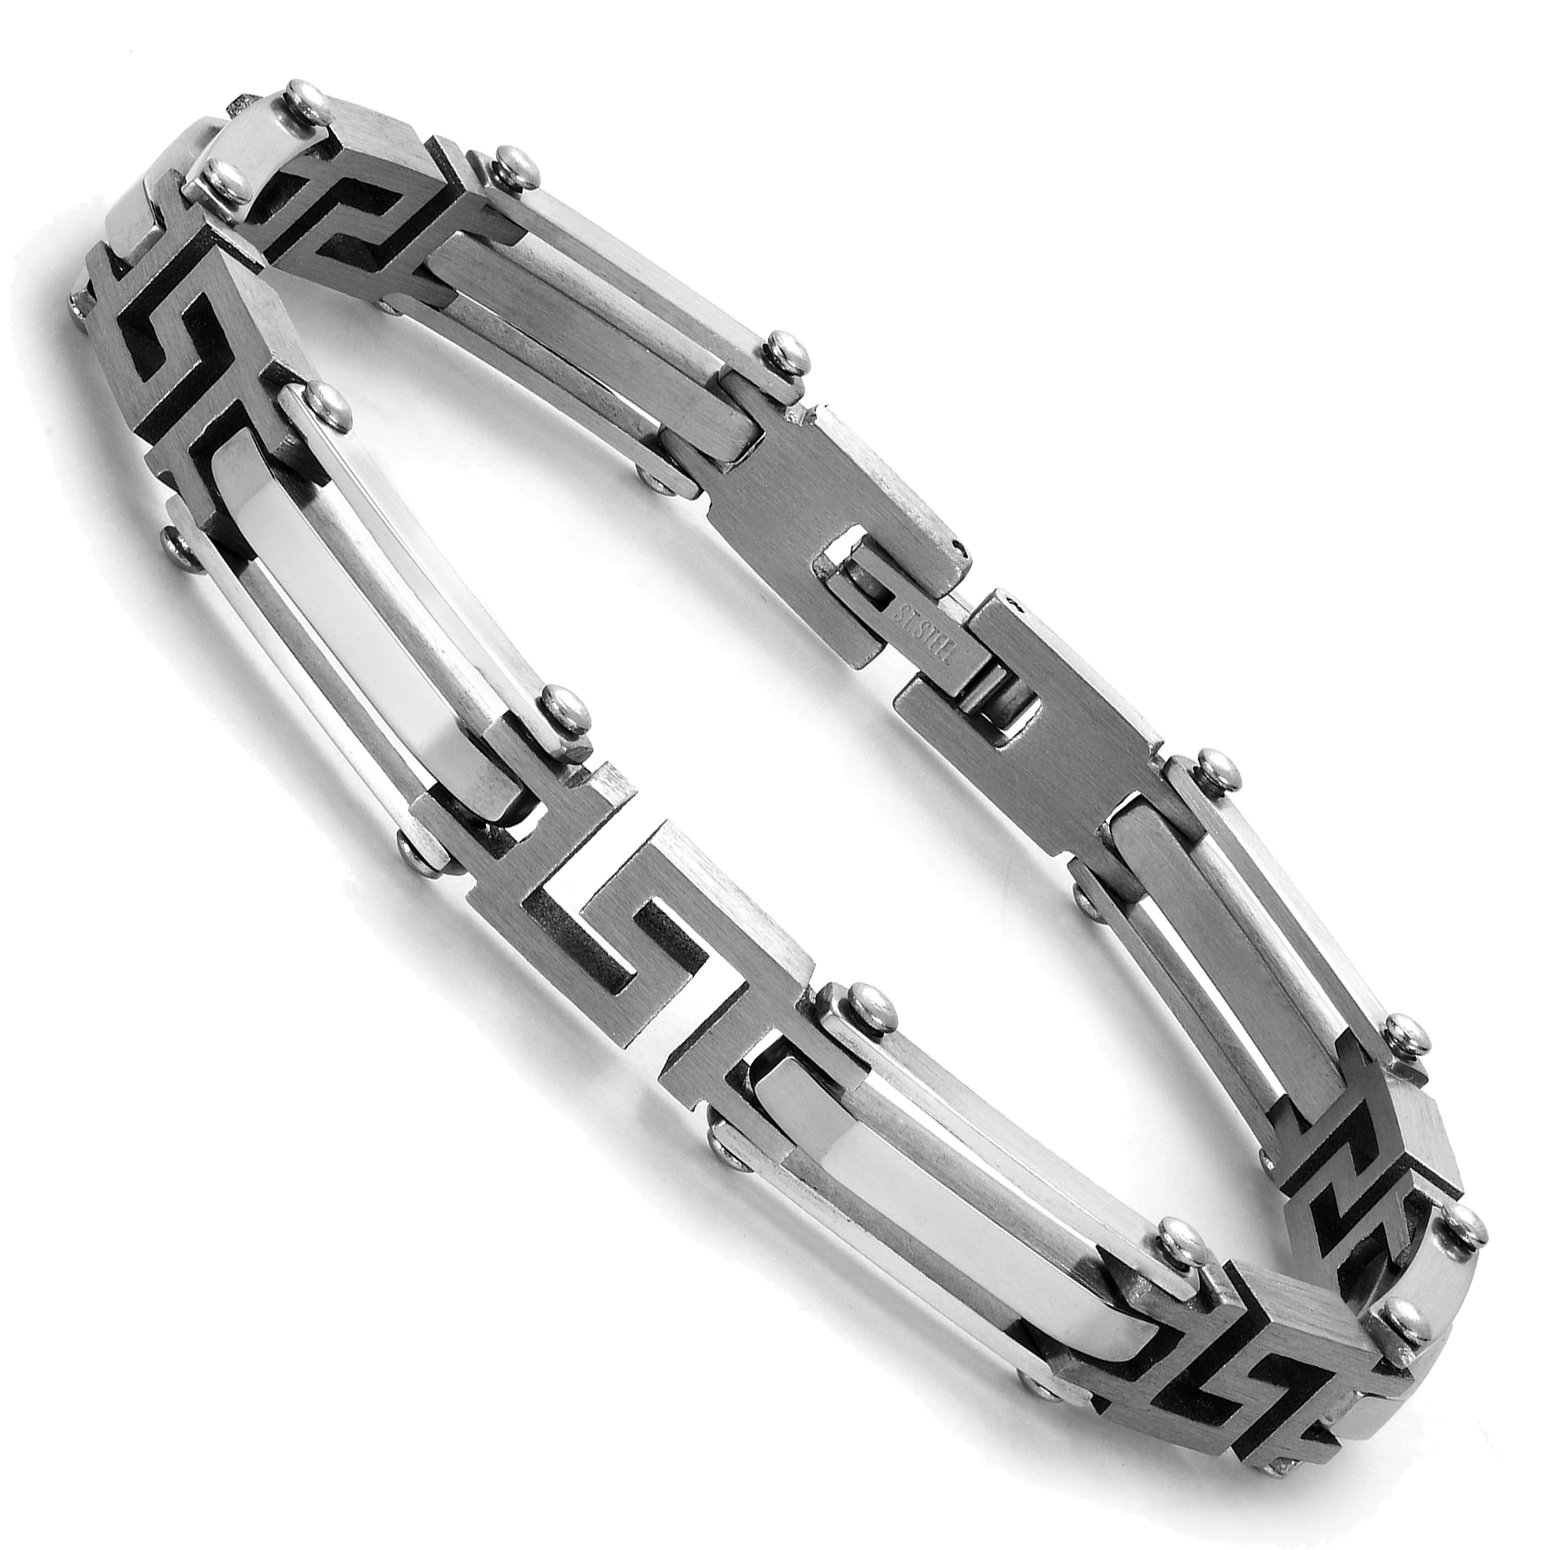 Urban Jewelry Elegant Silver Tone Link 316L Stainless Steel Bracelet for Men